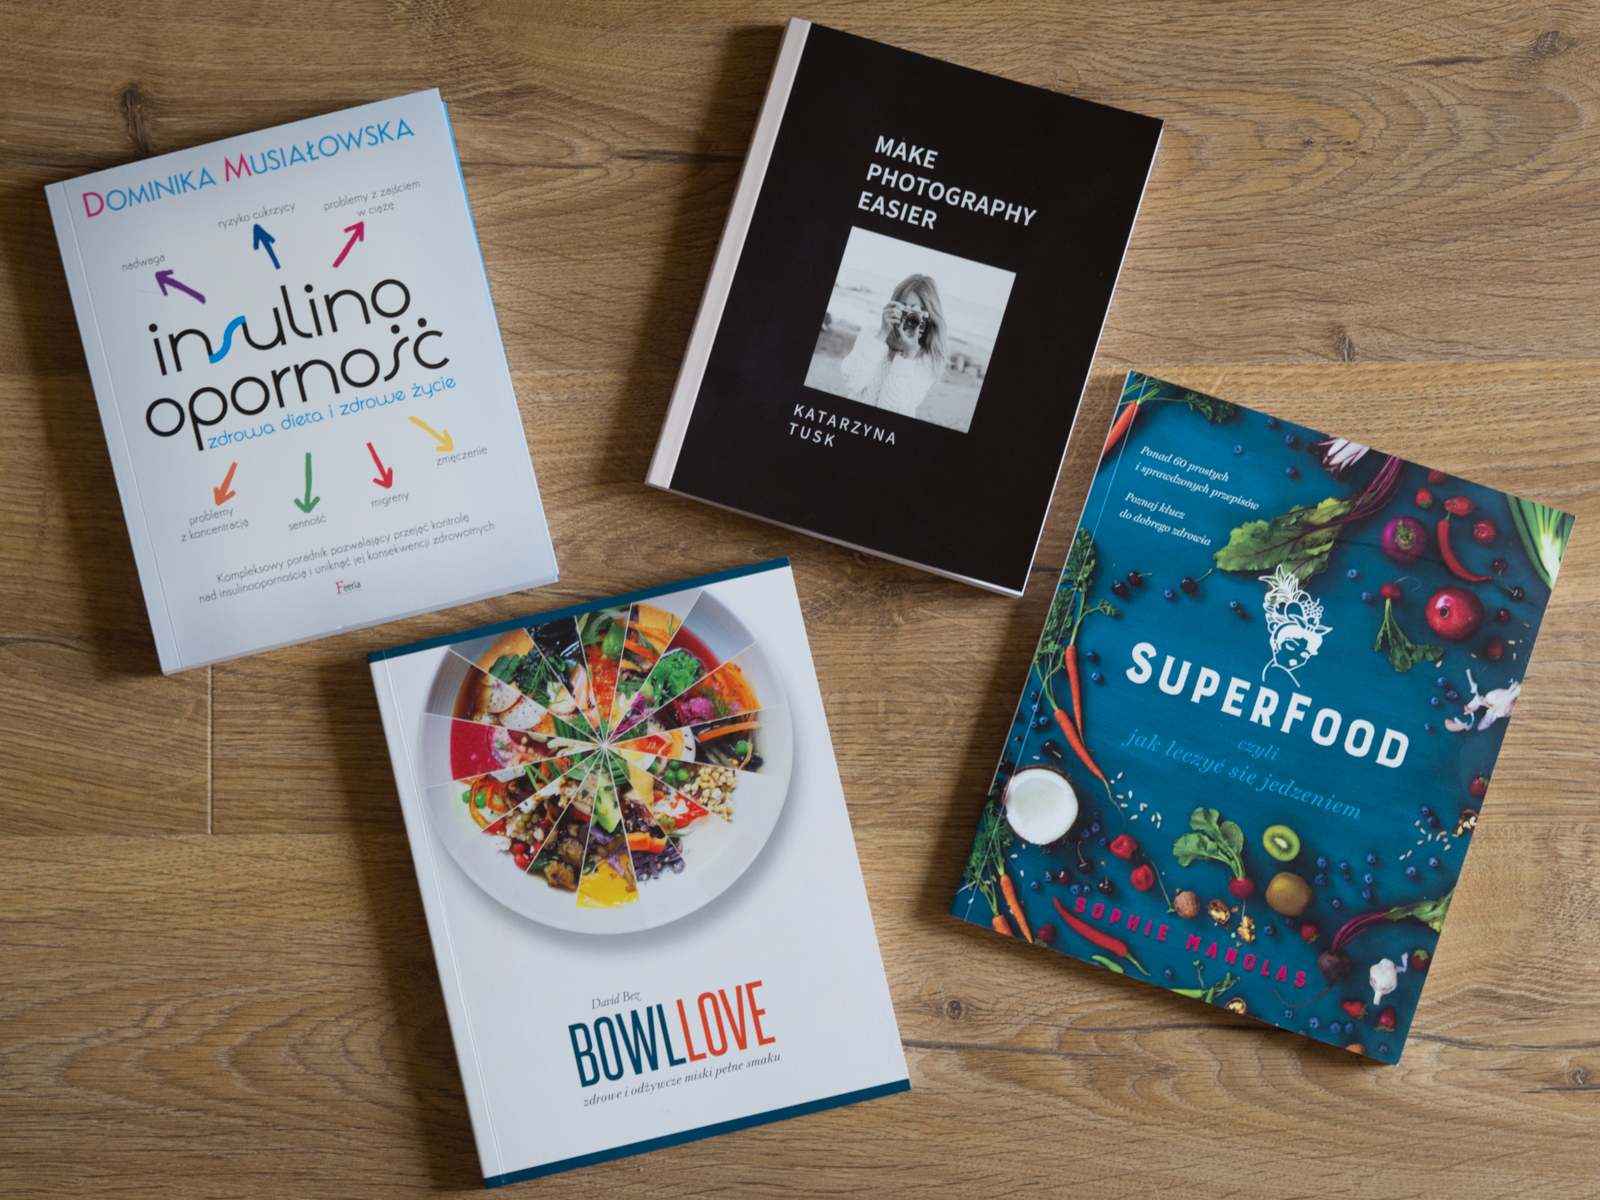 Biblioteka dietetyka #6 – bowllove, superfood, insulinooporność i make photography easier